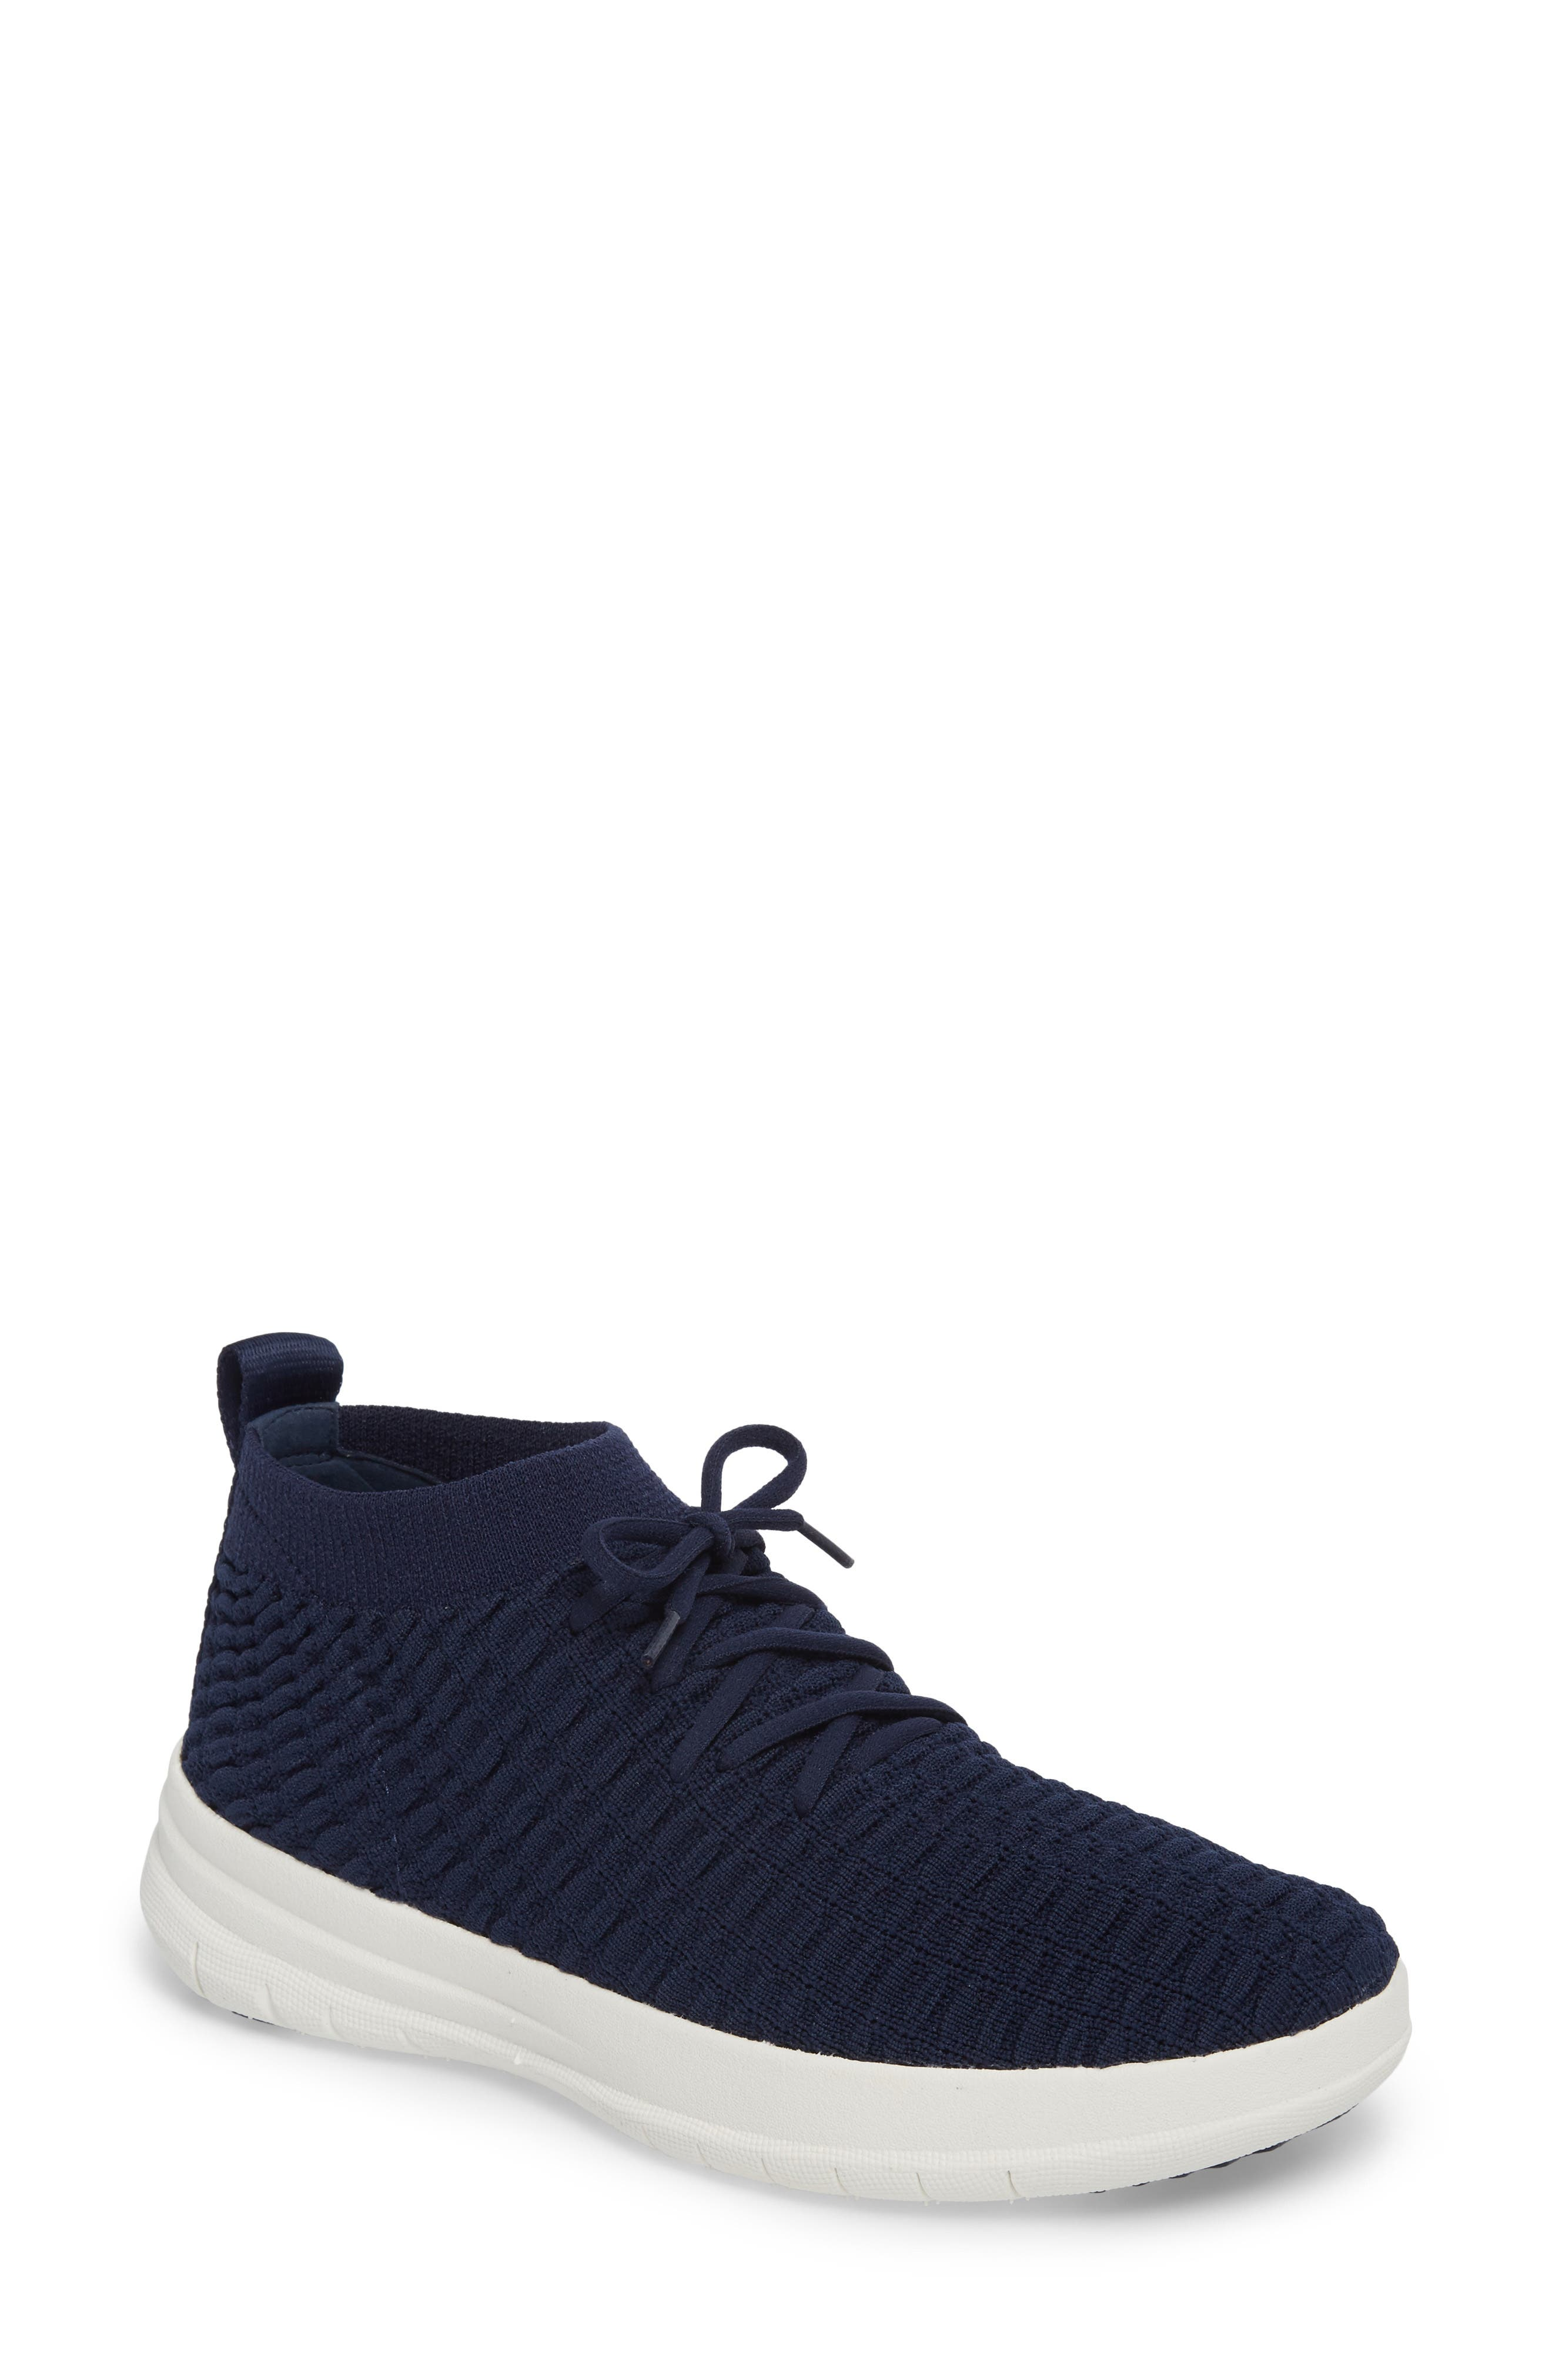 Uberknit<sup>™</sup> Slip-On High Top Sneaker,                             Main thumbnail 1, color,                             Midnight Navy